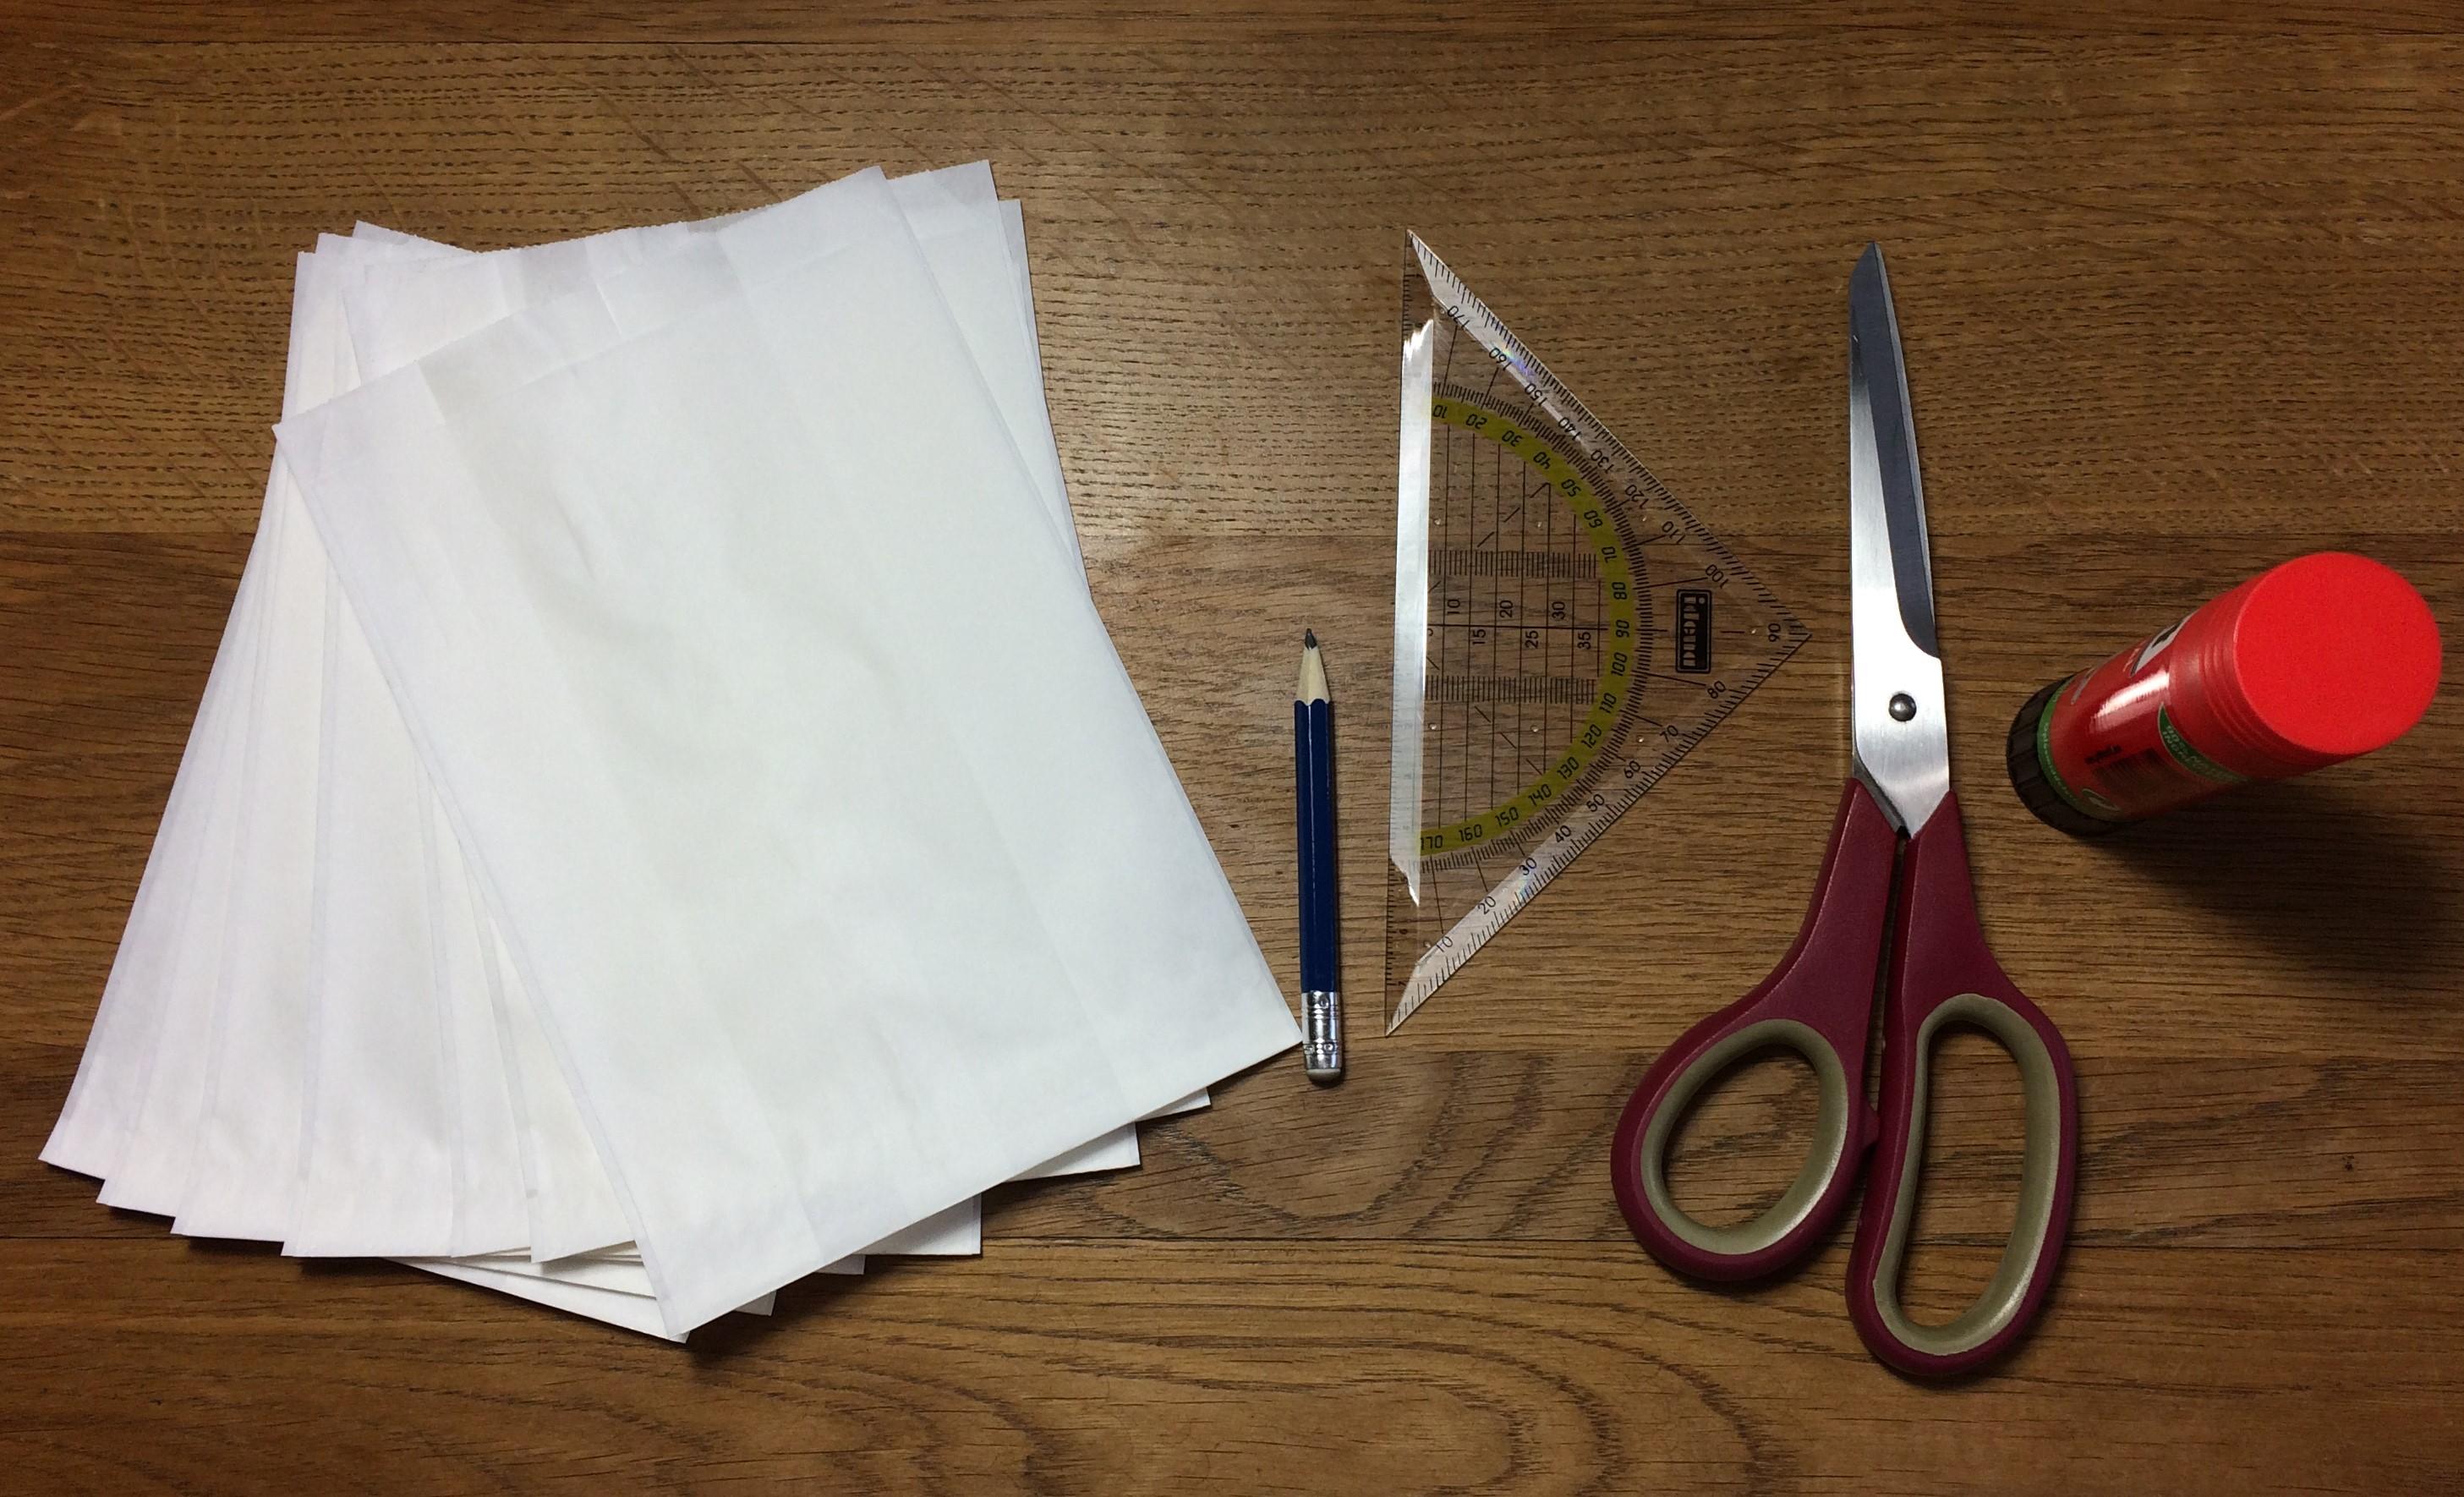 3 advent papierstern aus fr hst ckst ten basteln. Black Bedroom Furniture Sets. Home Design Ideas